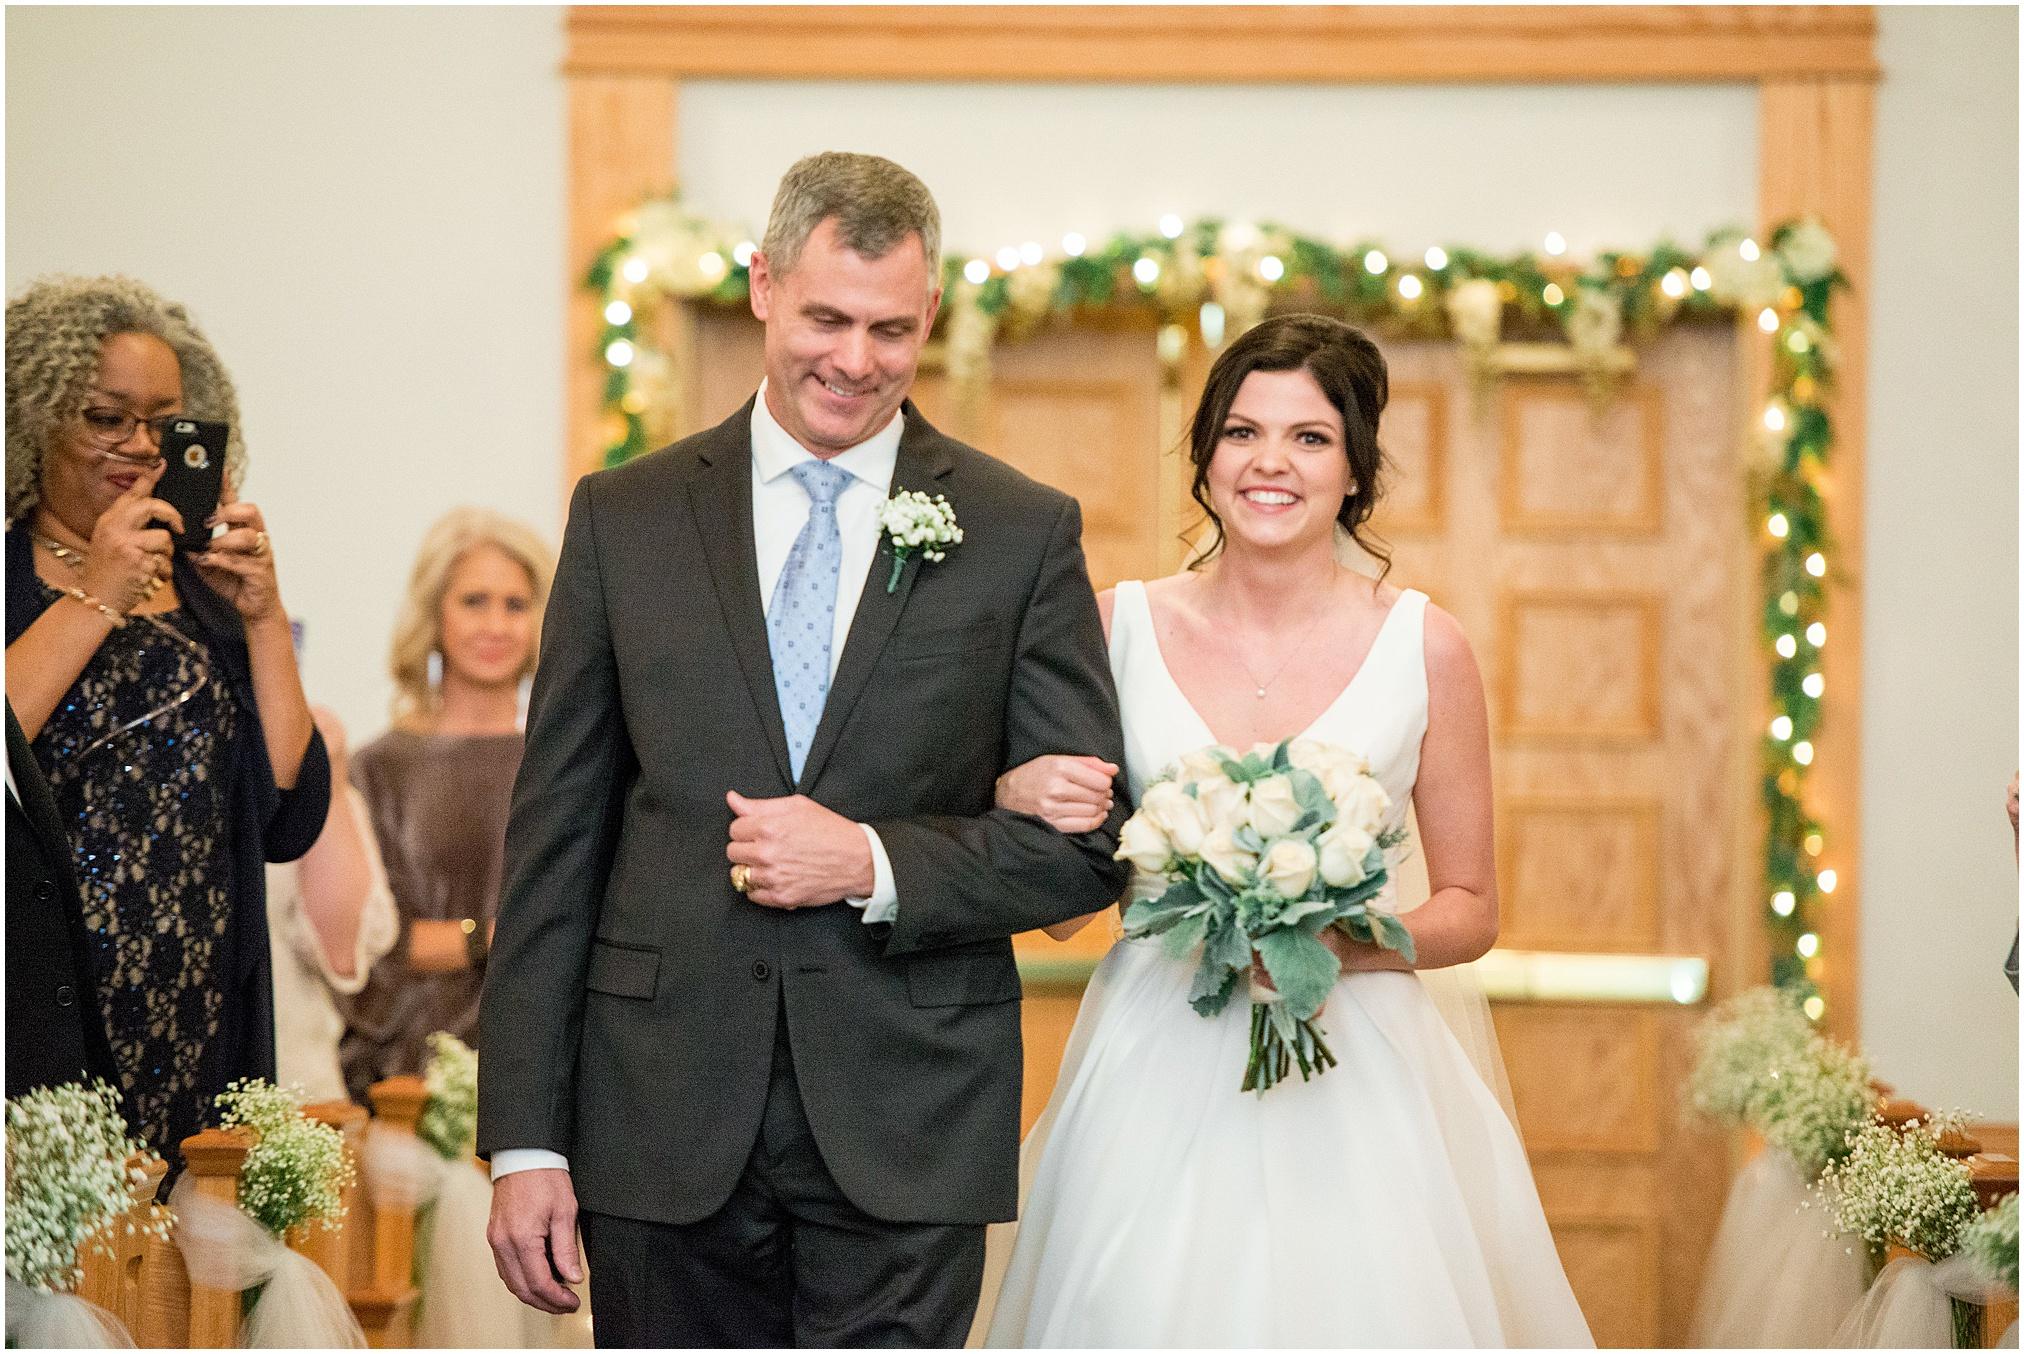 BridewalkingdownaisleManassasWedding.PhotographybyLeandra_0216.jpg